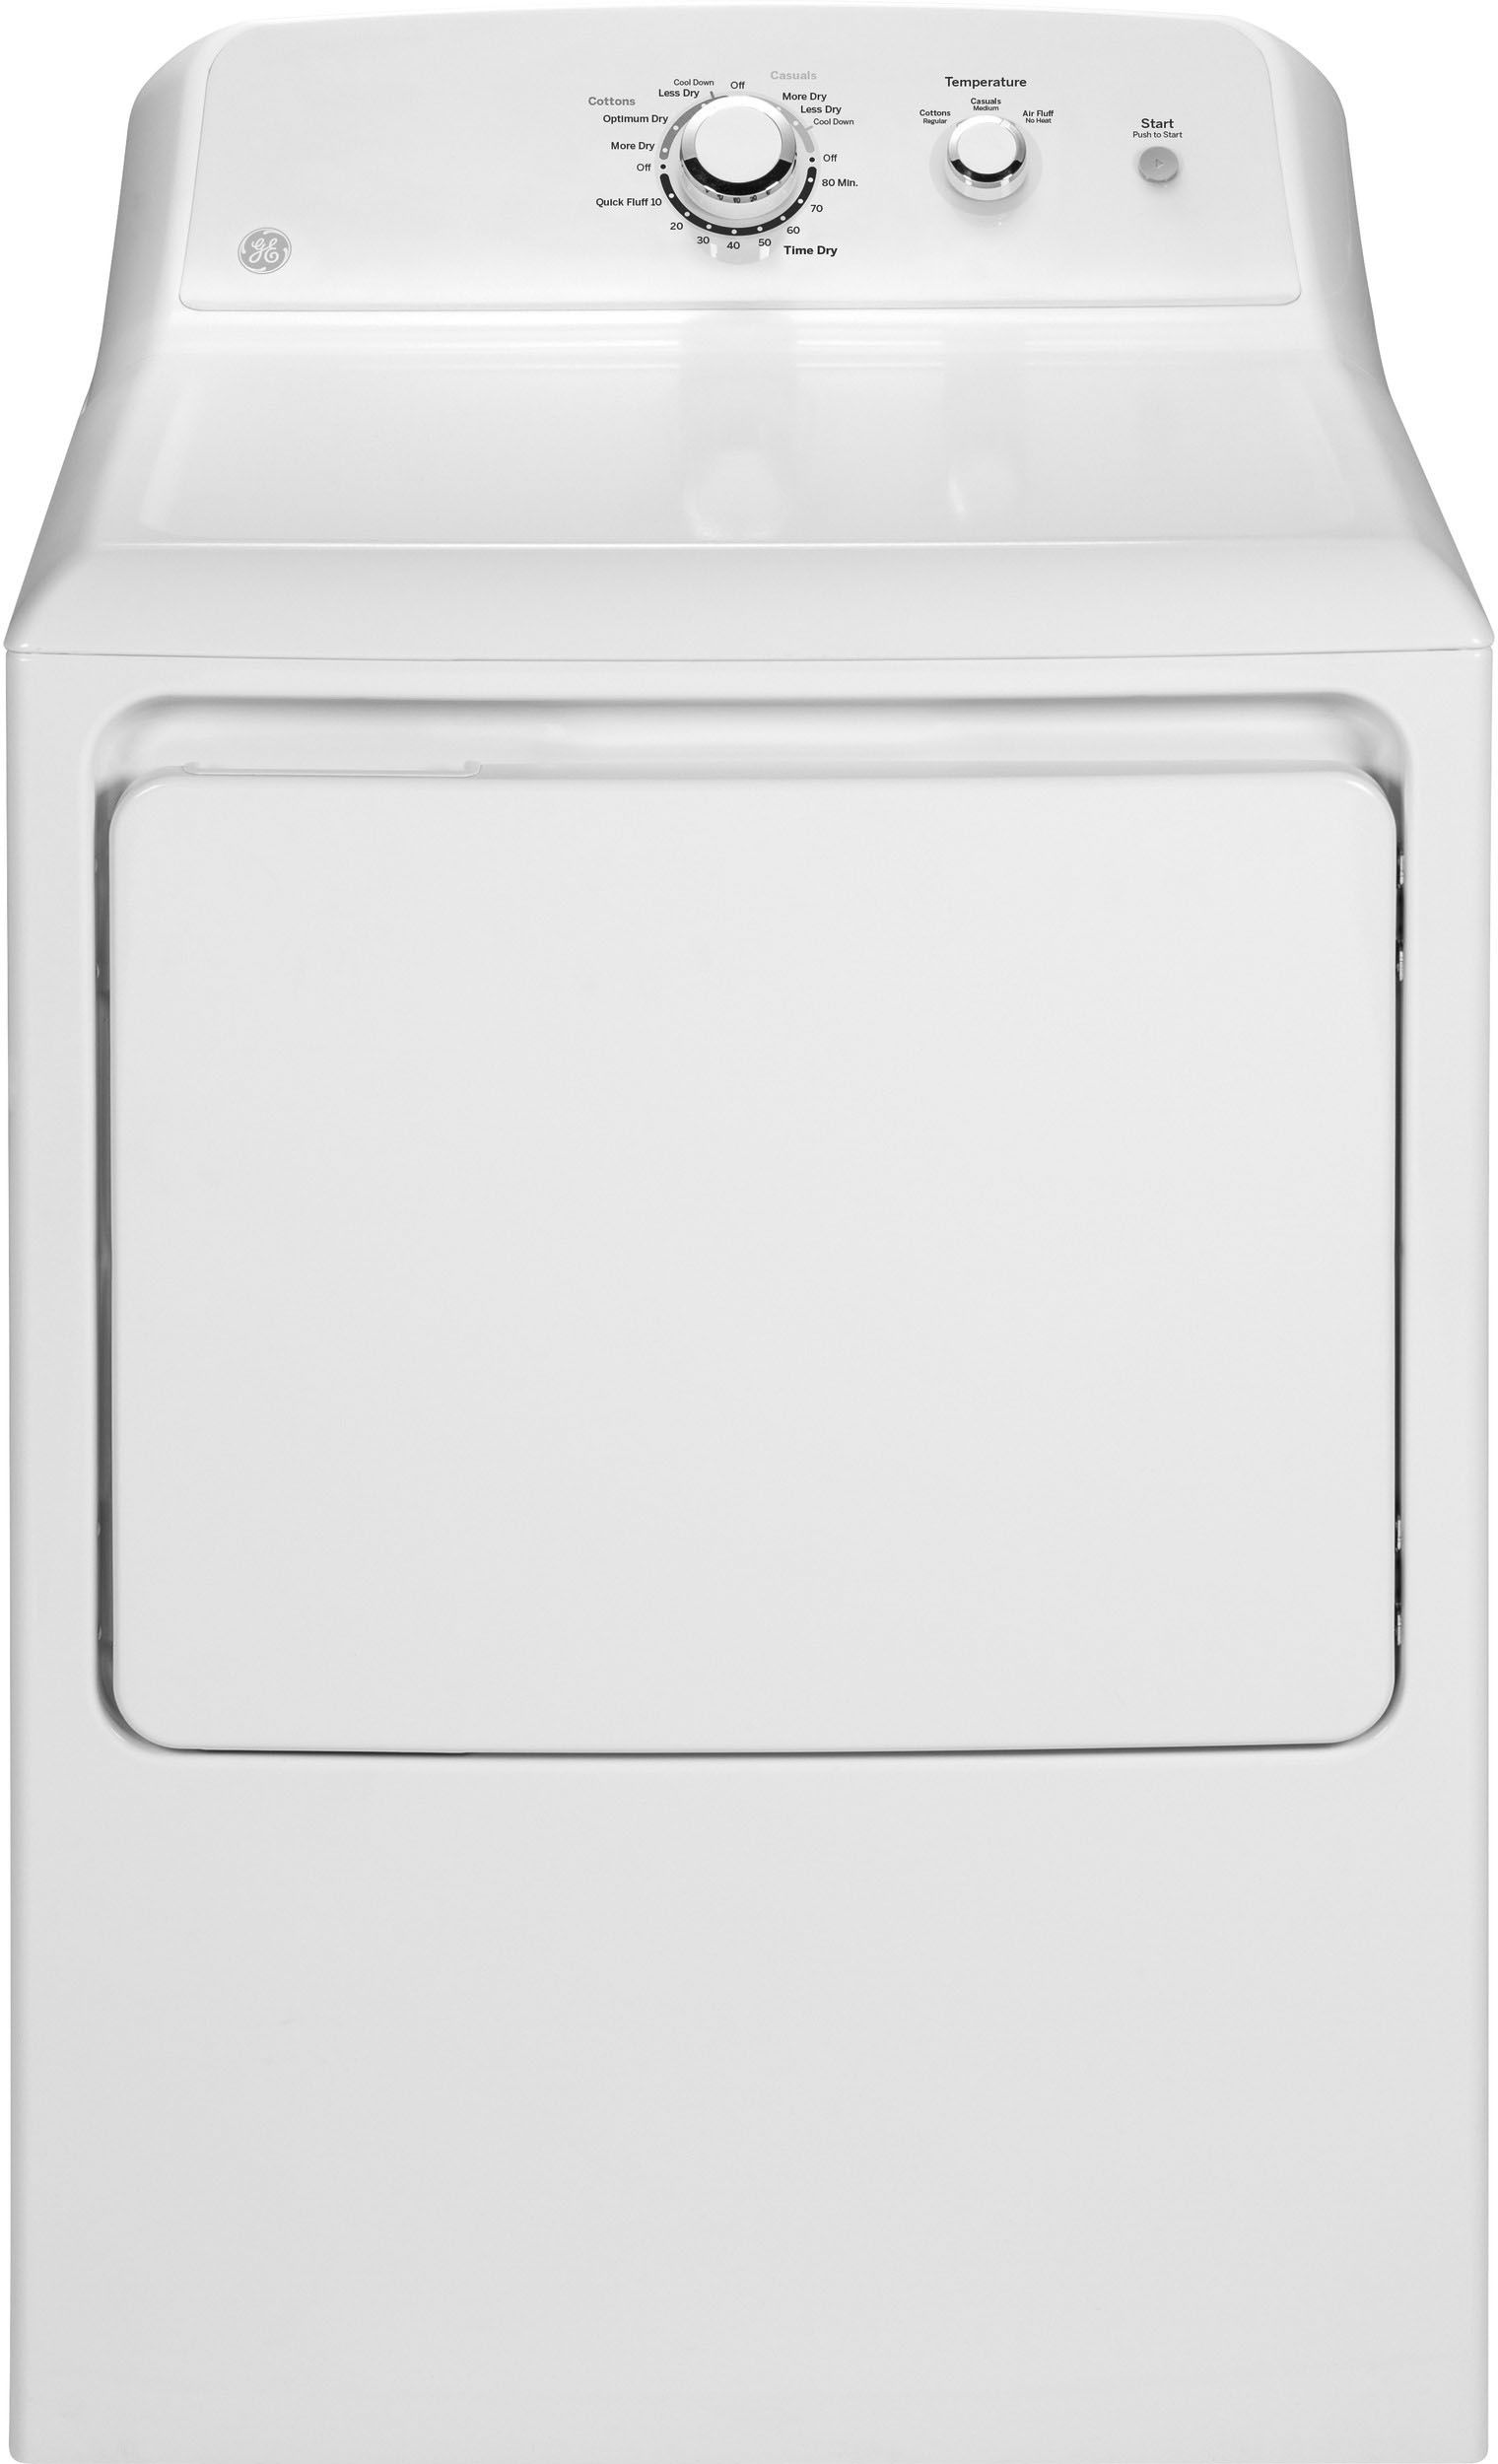 Ge 174 Front Load Electric Dryer White Gtd33easkww Ellis